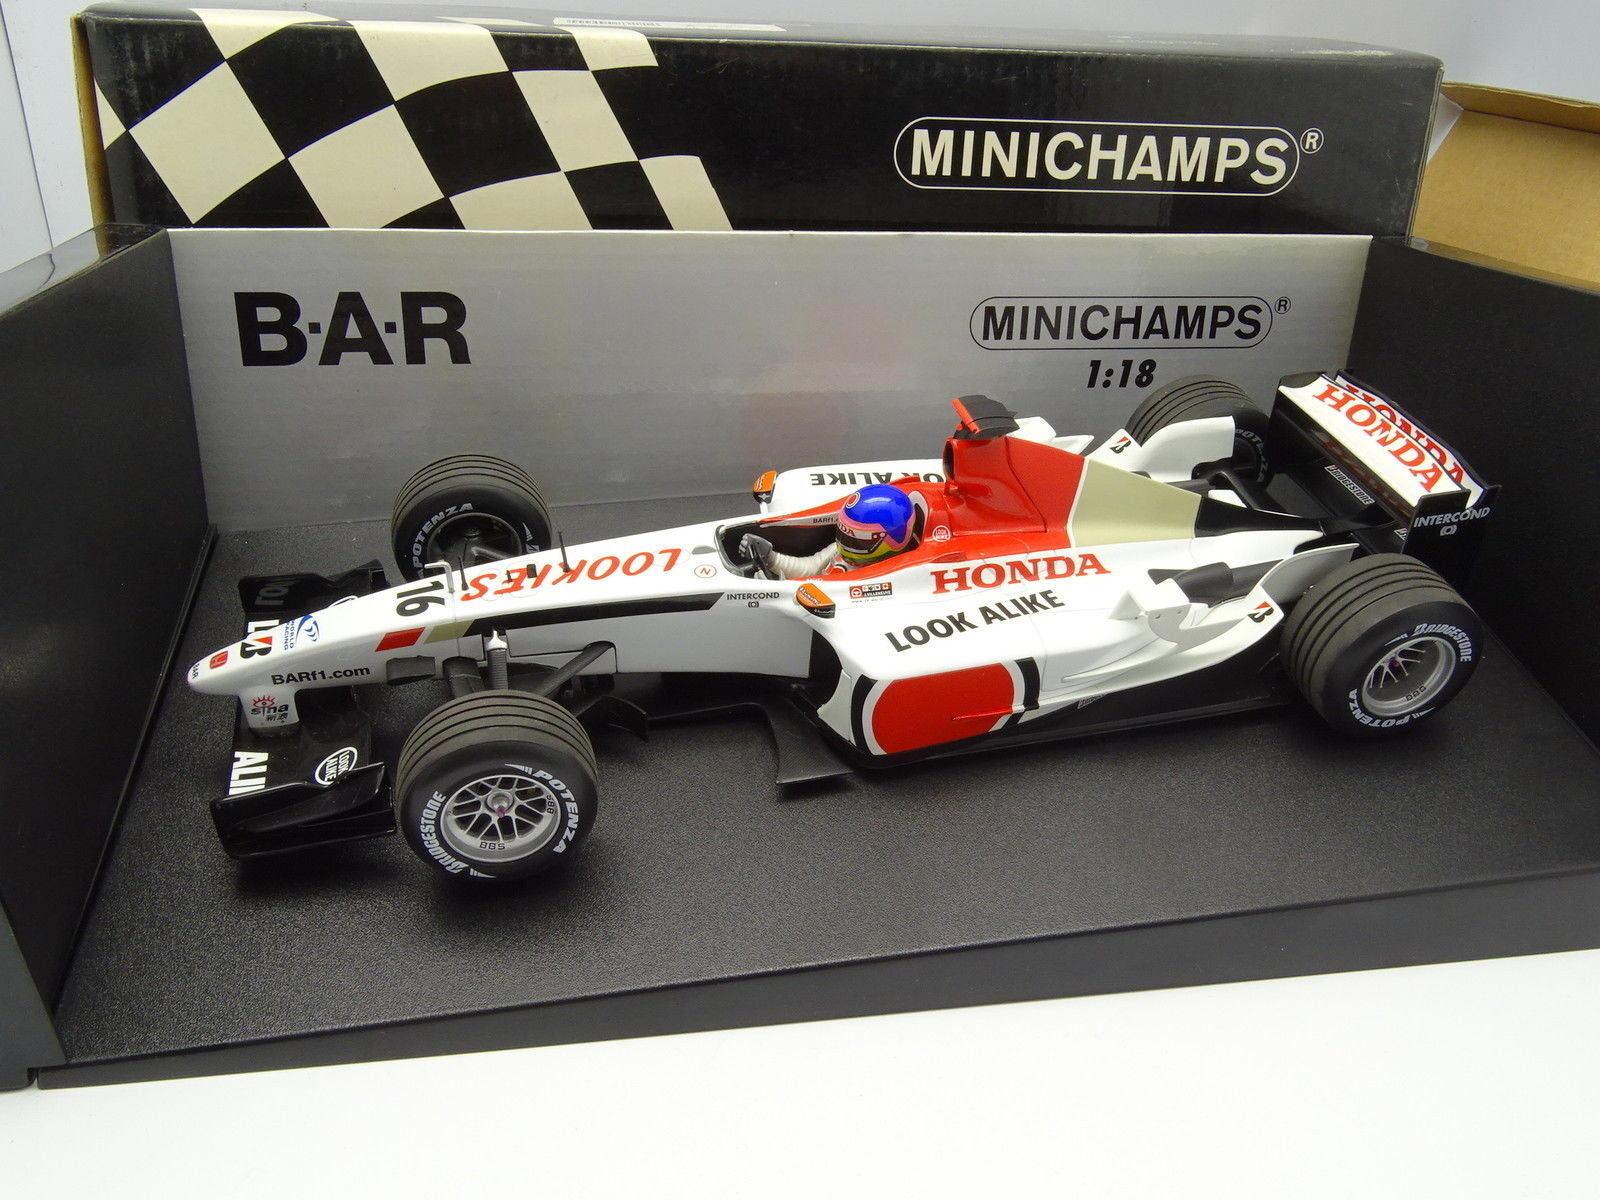 Minichamps 1   18 - formel - 1 - bar - honda - 005 villeneuve